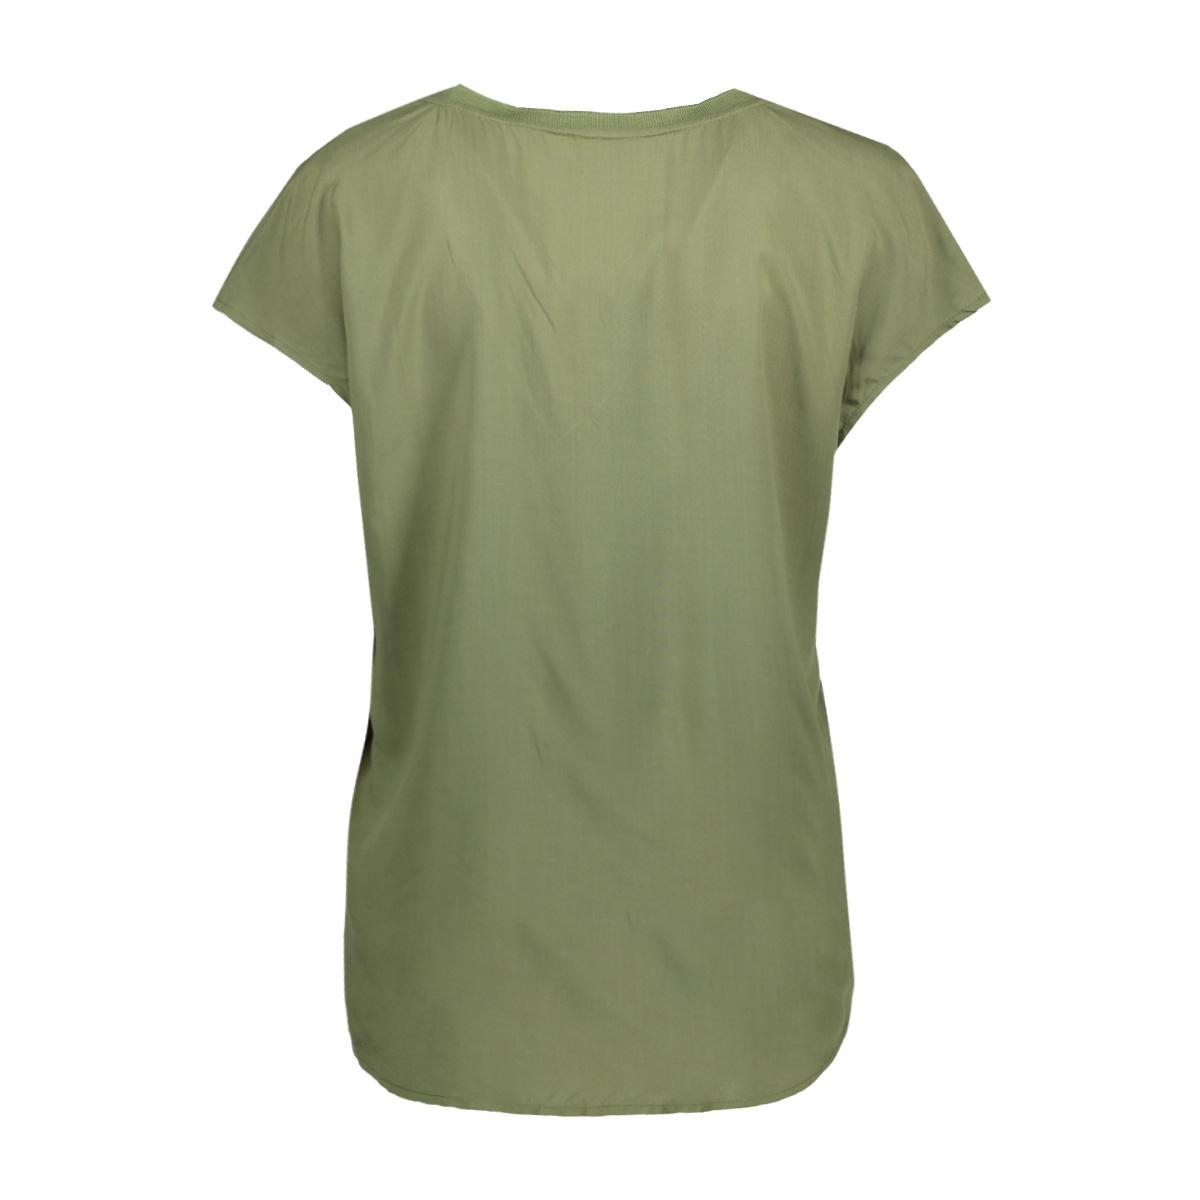 vilalla top/1 14044277 vila t-shirt olivine